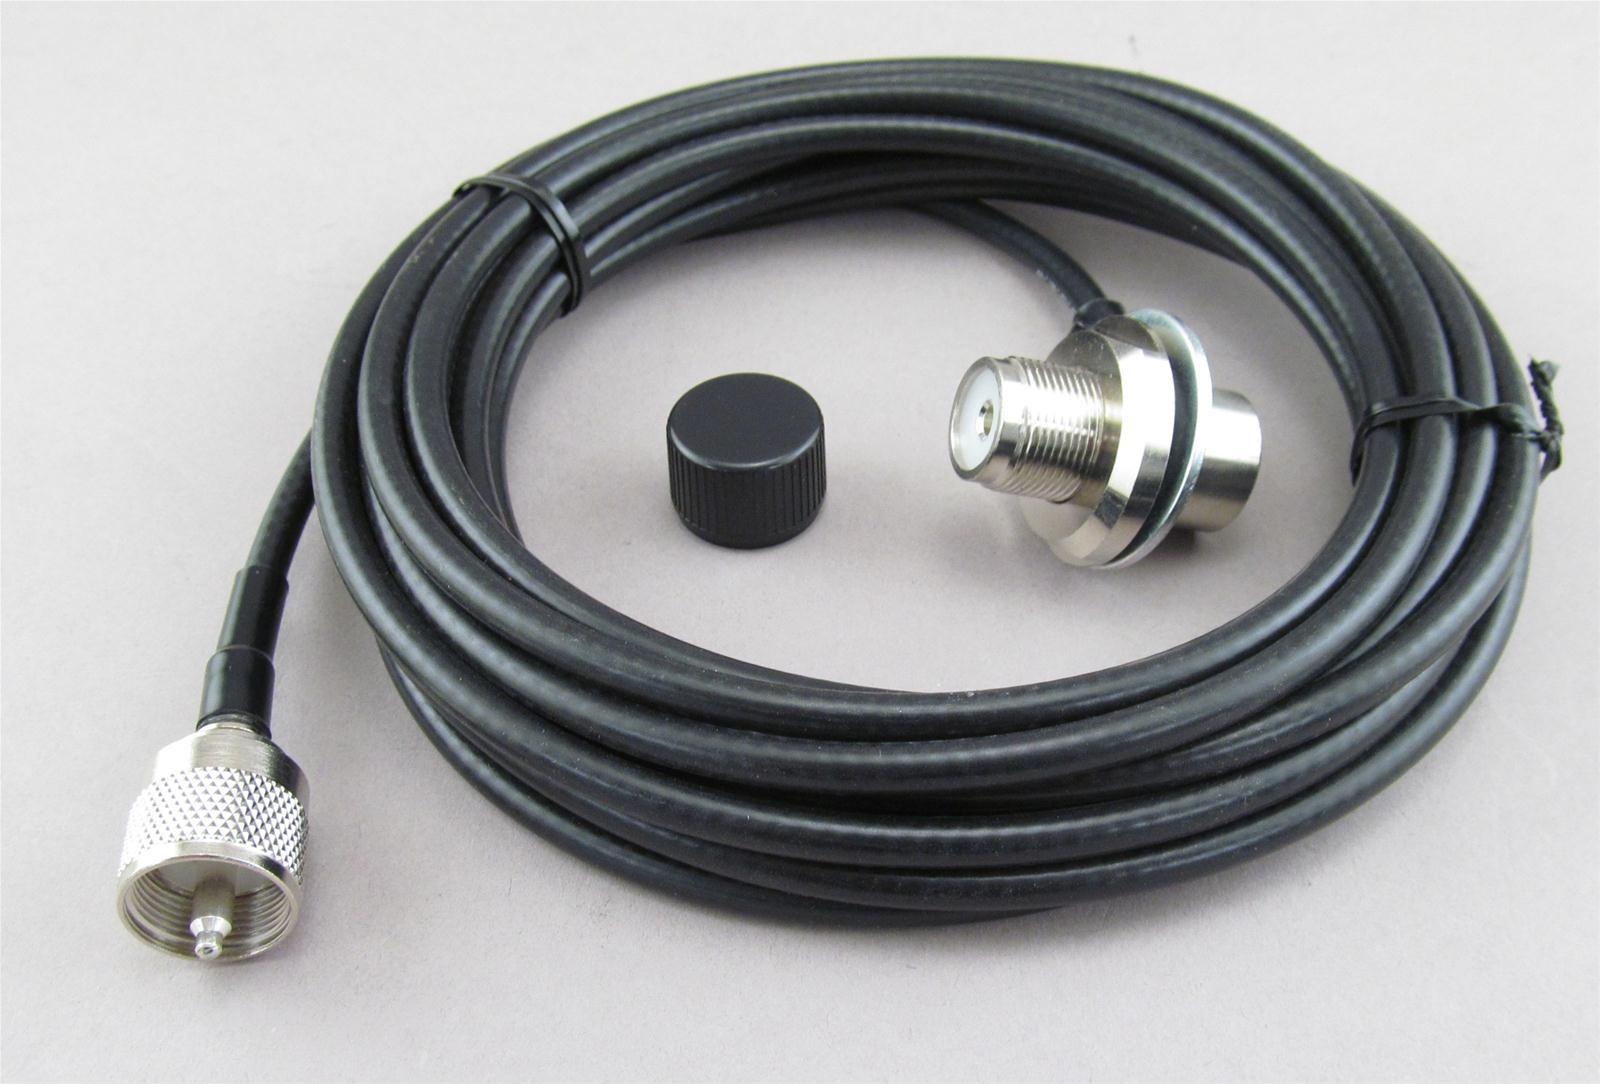 Standard Cable Assemblies : Comet cr m standard cable assemblies free